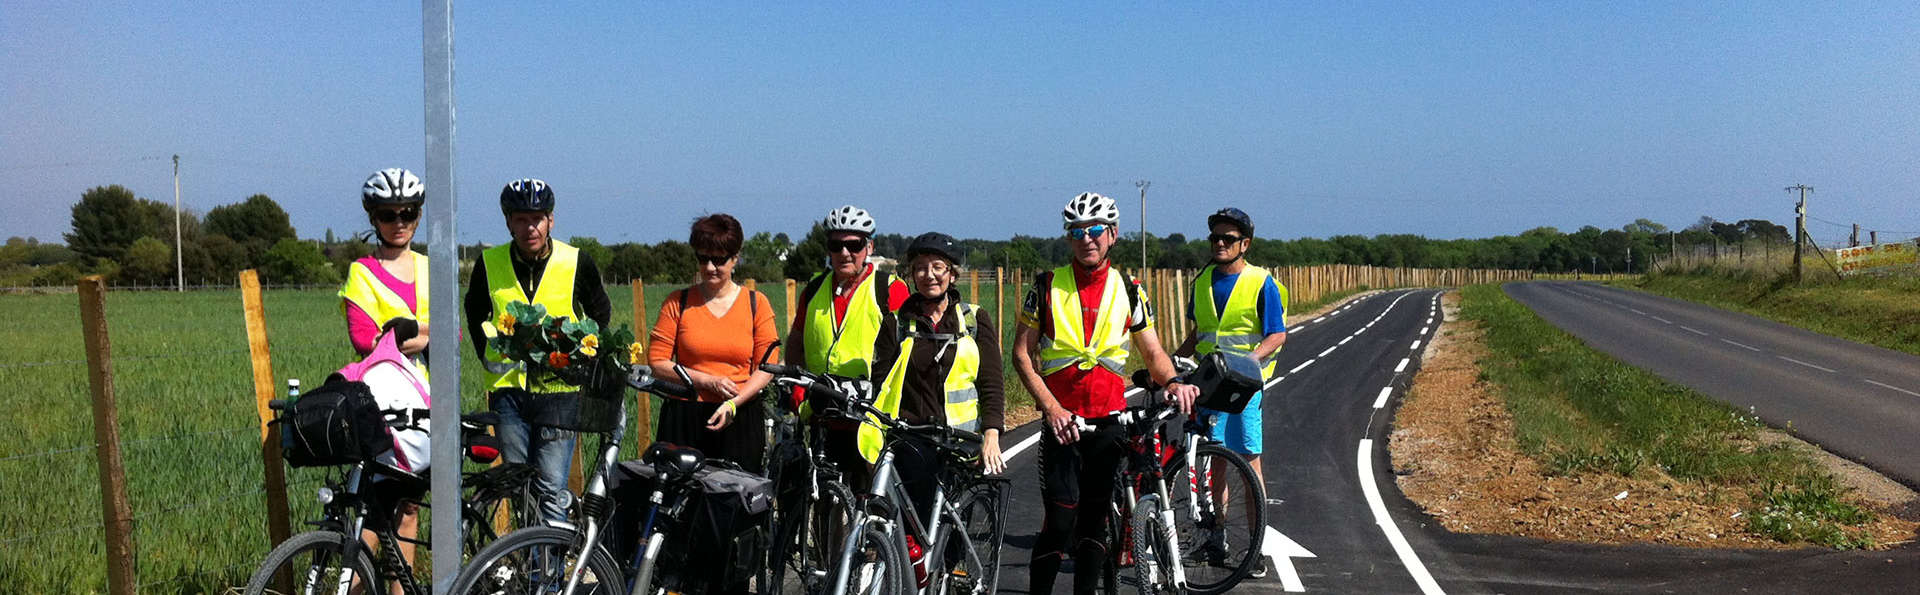 Week-end en famille en plein coeur du Gard avec balade guidée de Nîmes en vélo